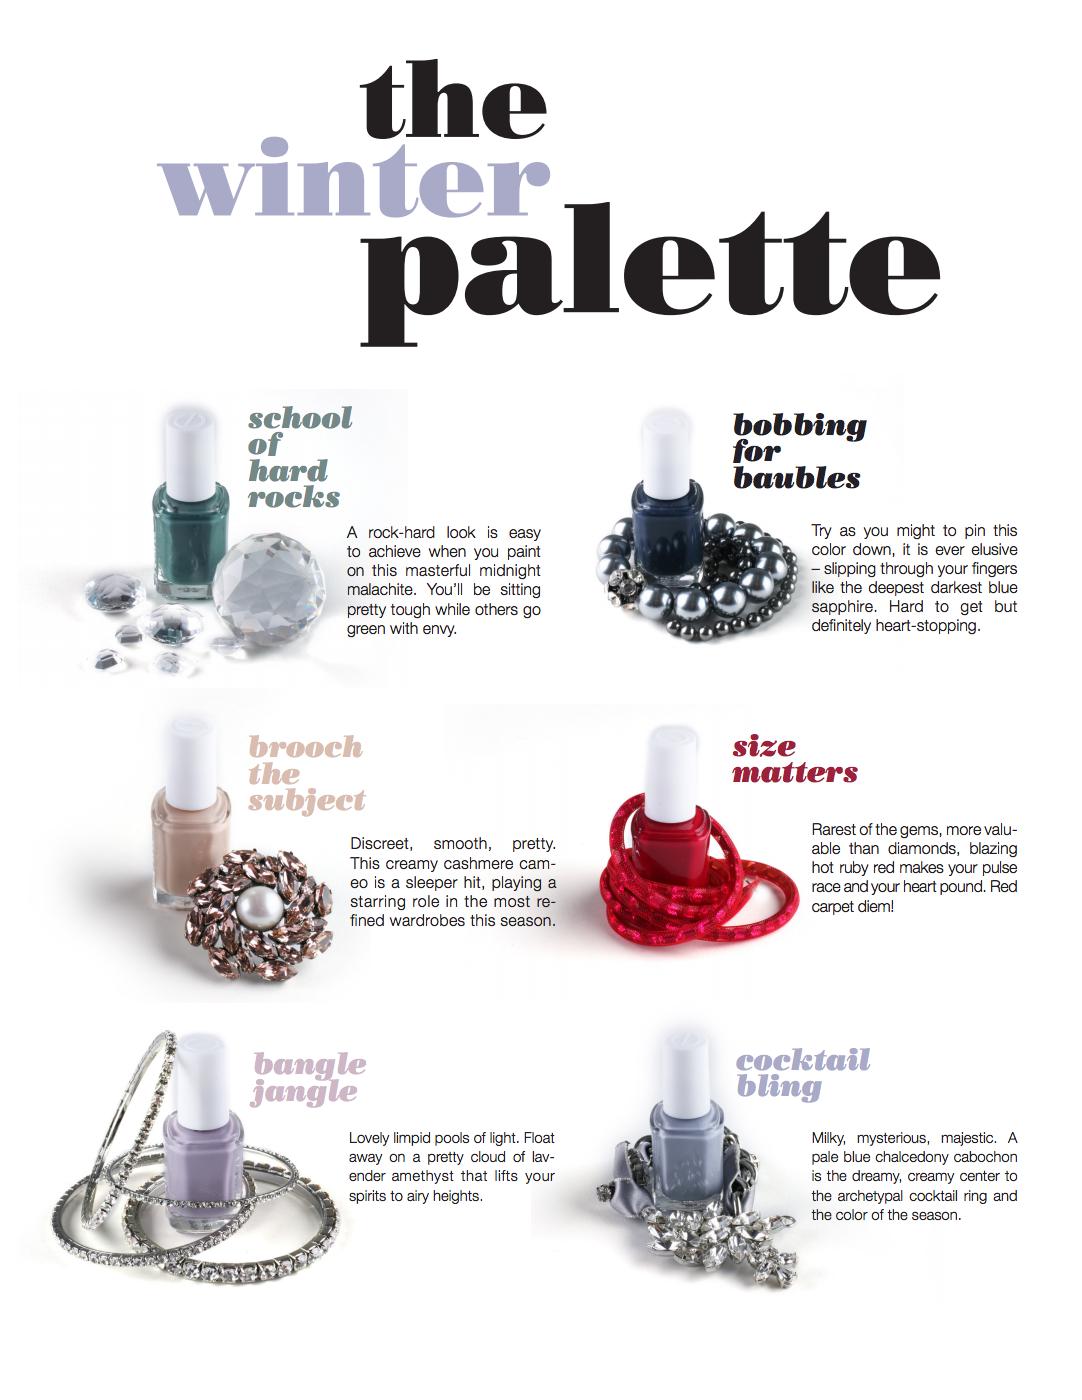 Top 6 Winter Palette